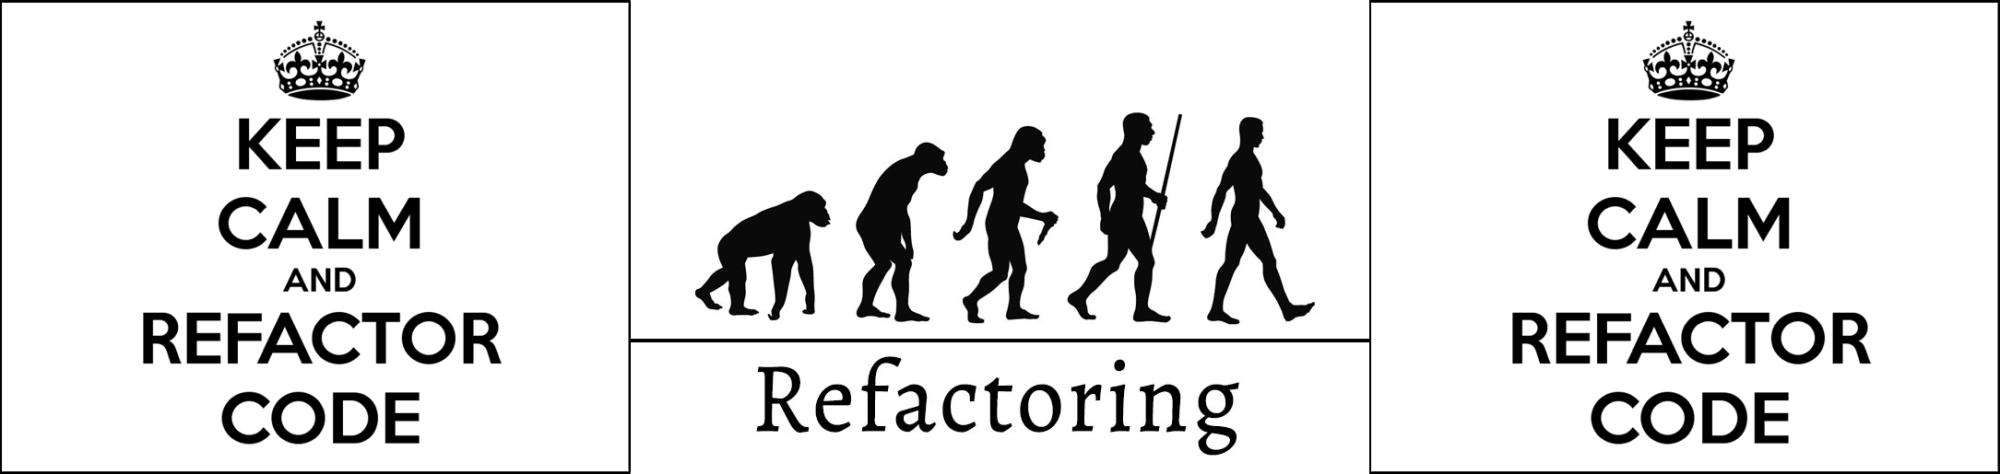 Flock.ing @ bol.com - Refactoring the Mobile App API